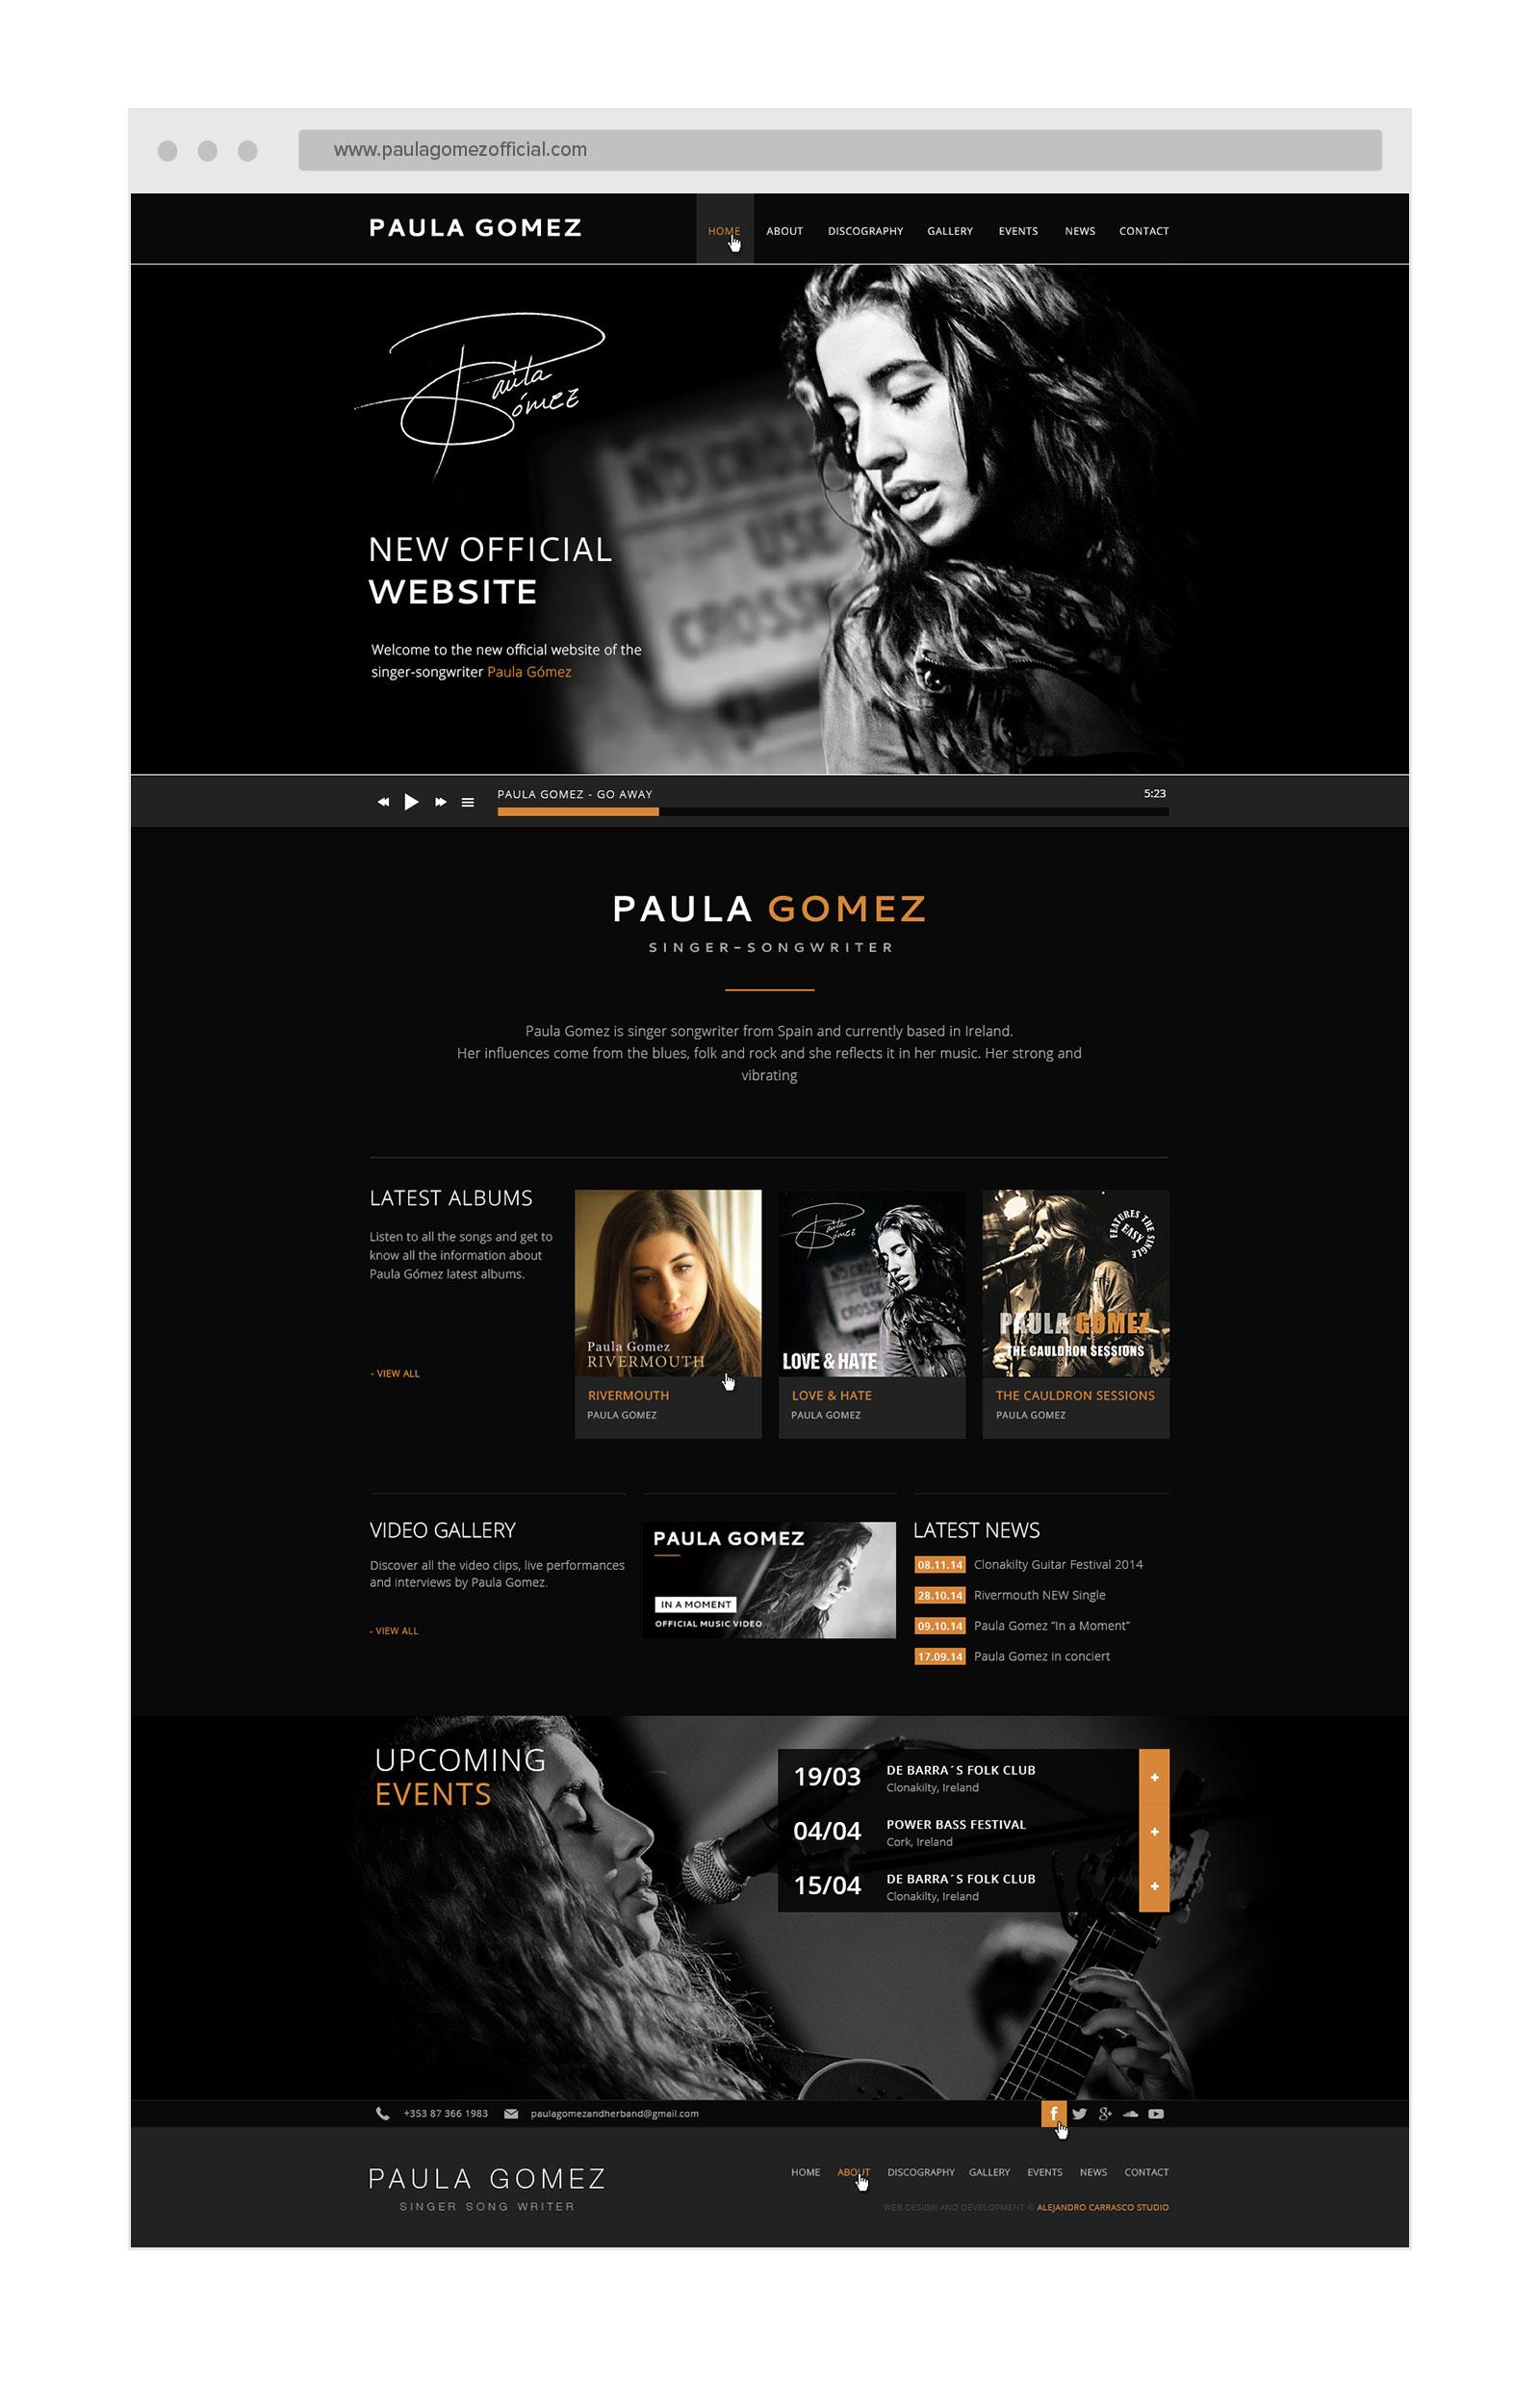 paula-gomez-website-01.jpg